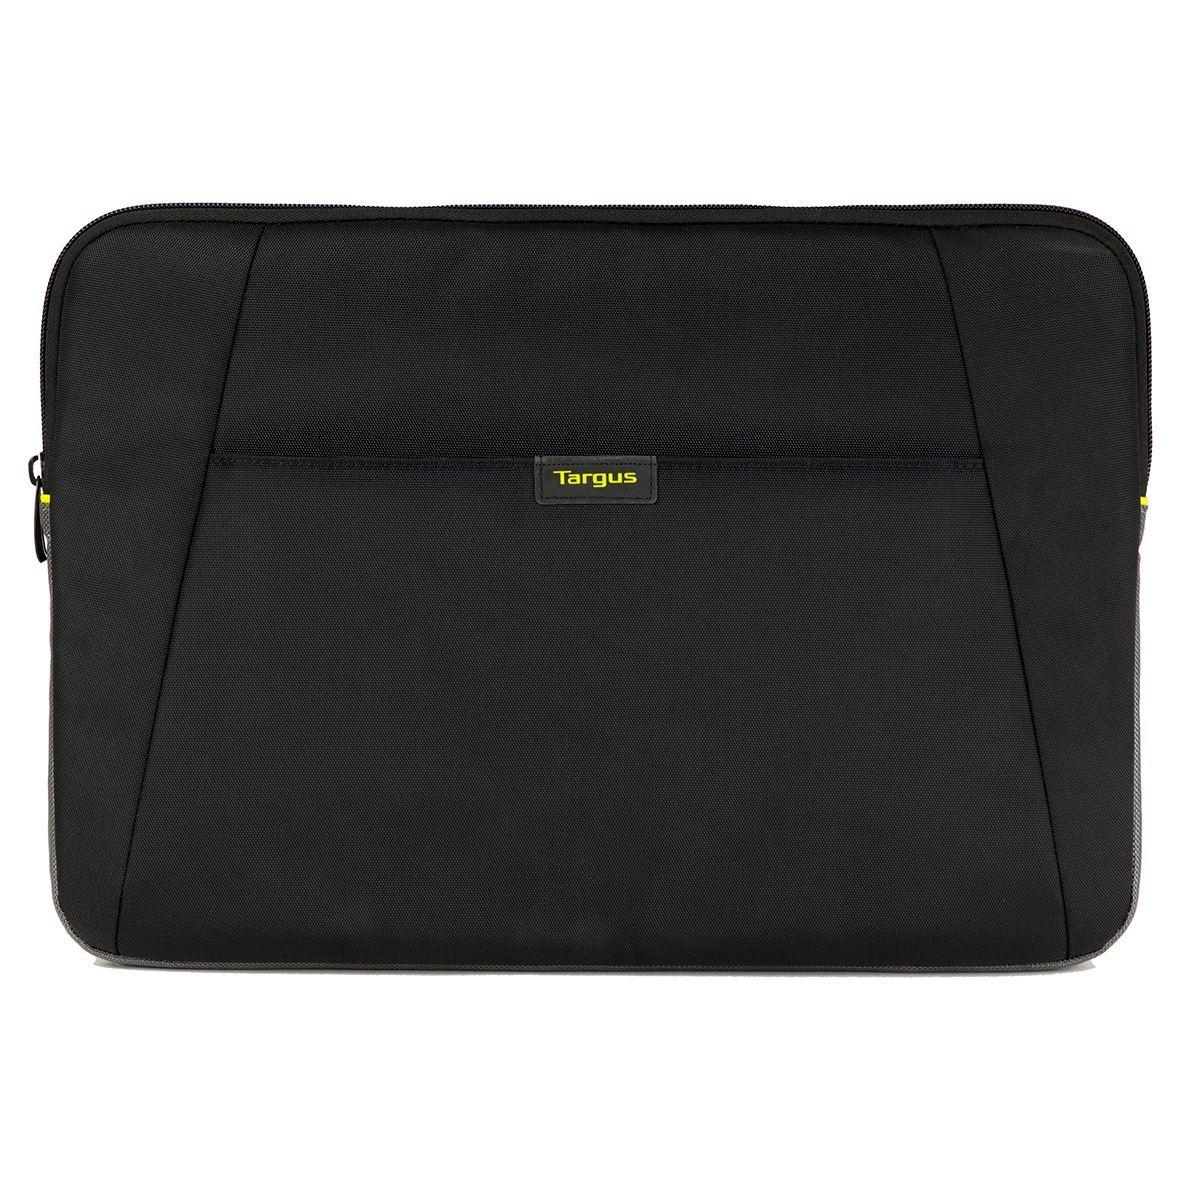 Targus CityGear 11.6 inch Laptop Sleeve - Notebook-Hülle - 11.6